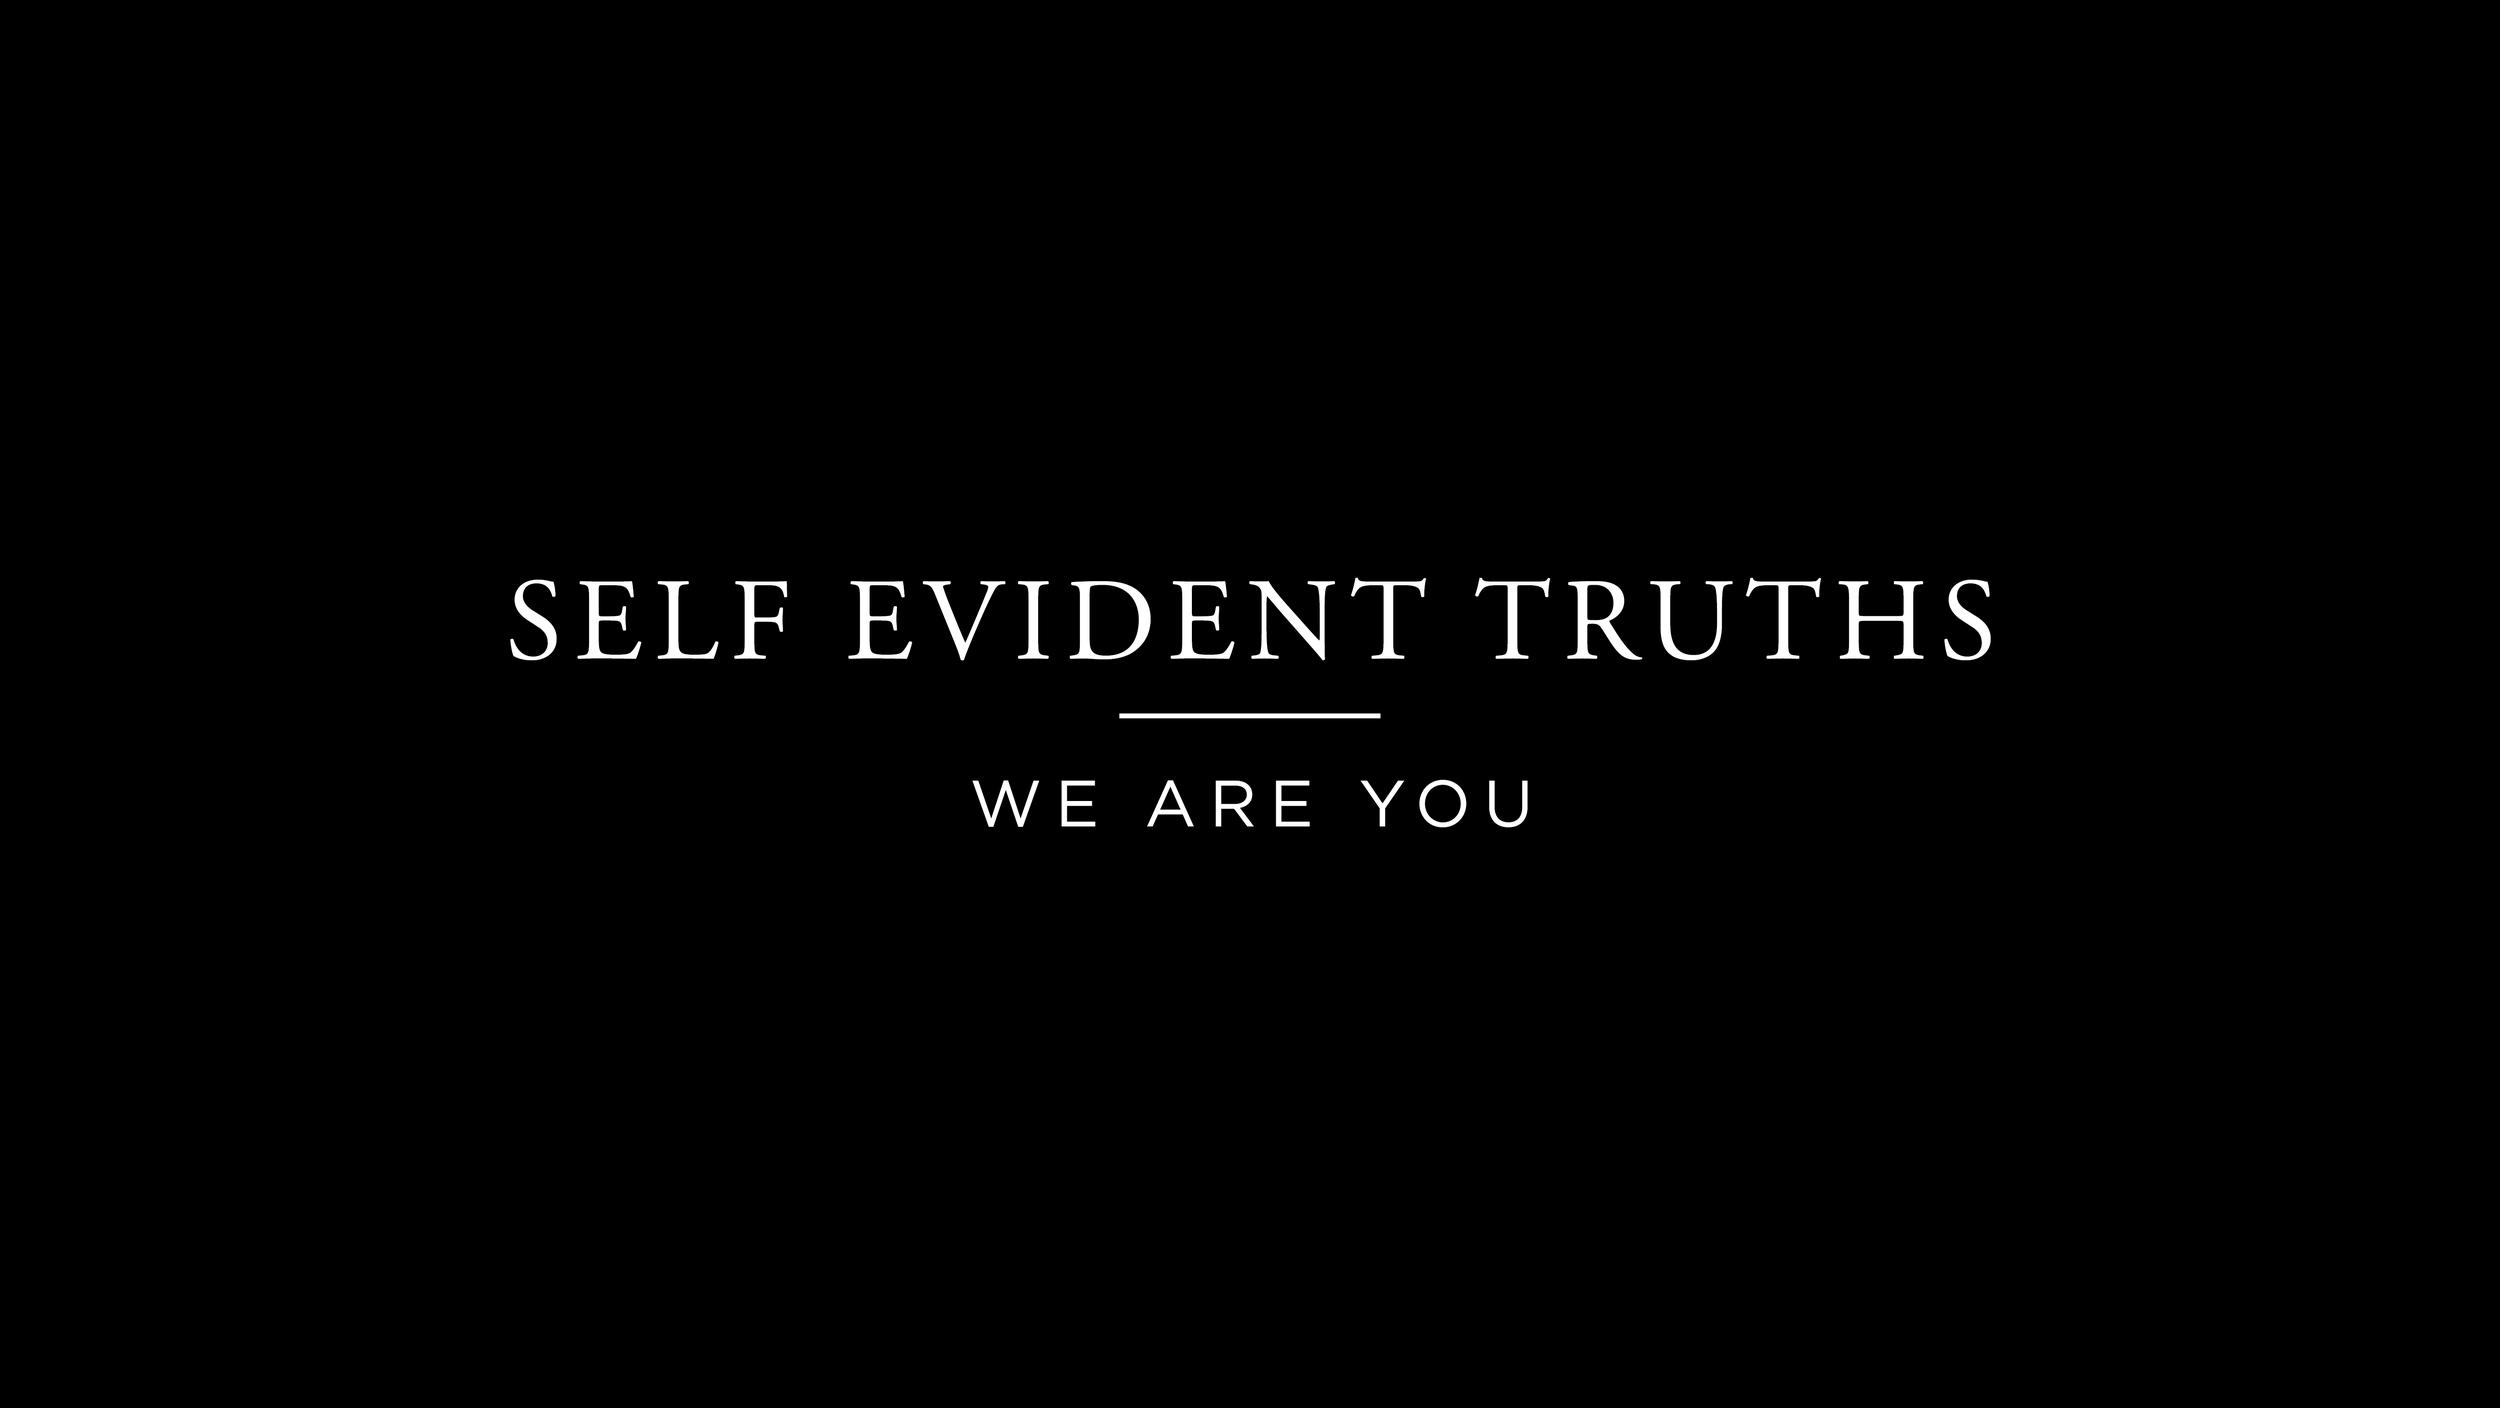 self-evident-truths.jpg